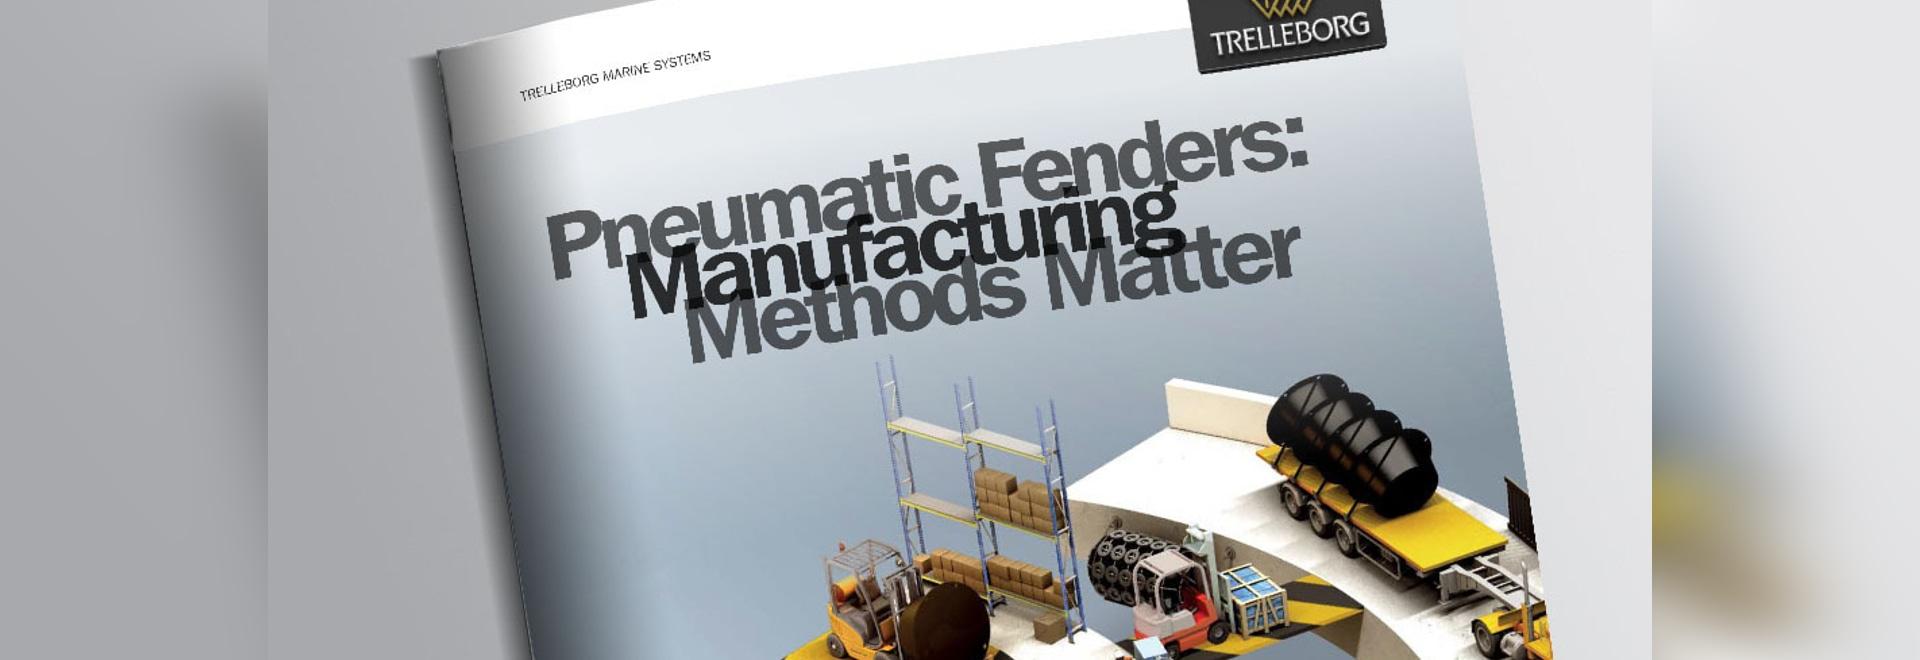 Pneumatic Fenders: Manufacturing Methods Matter